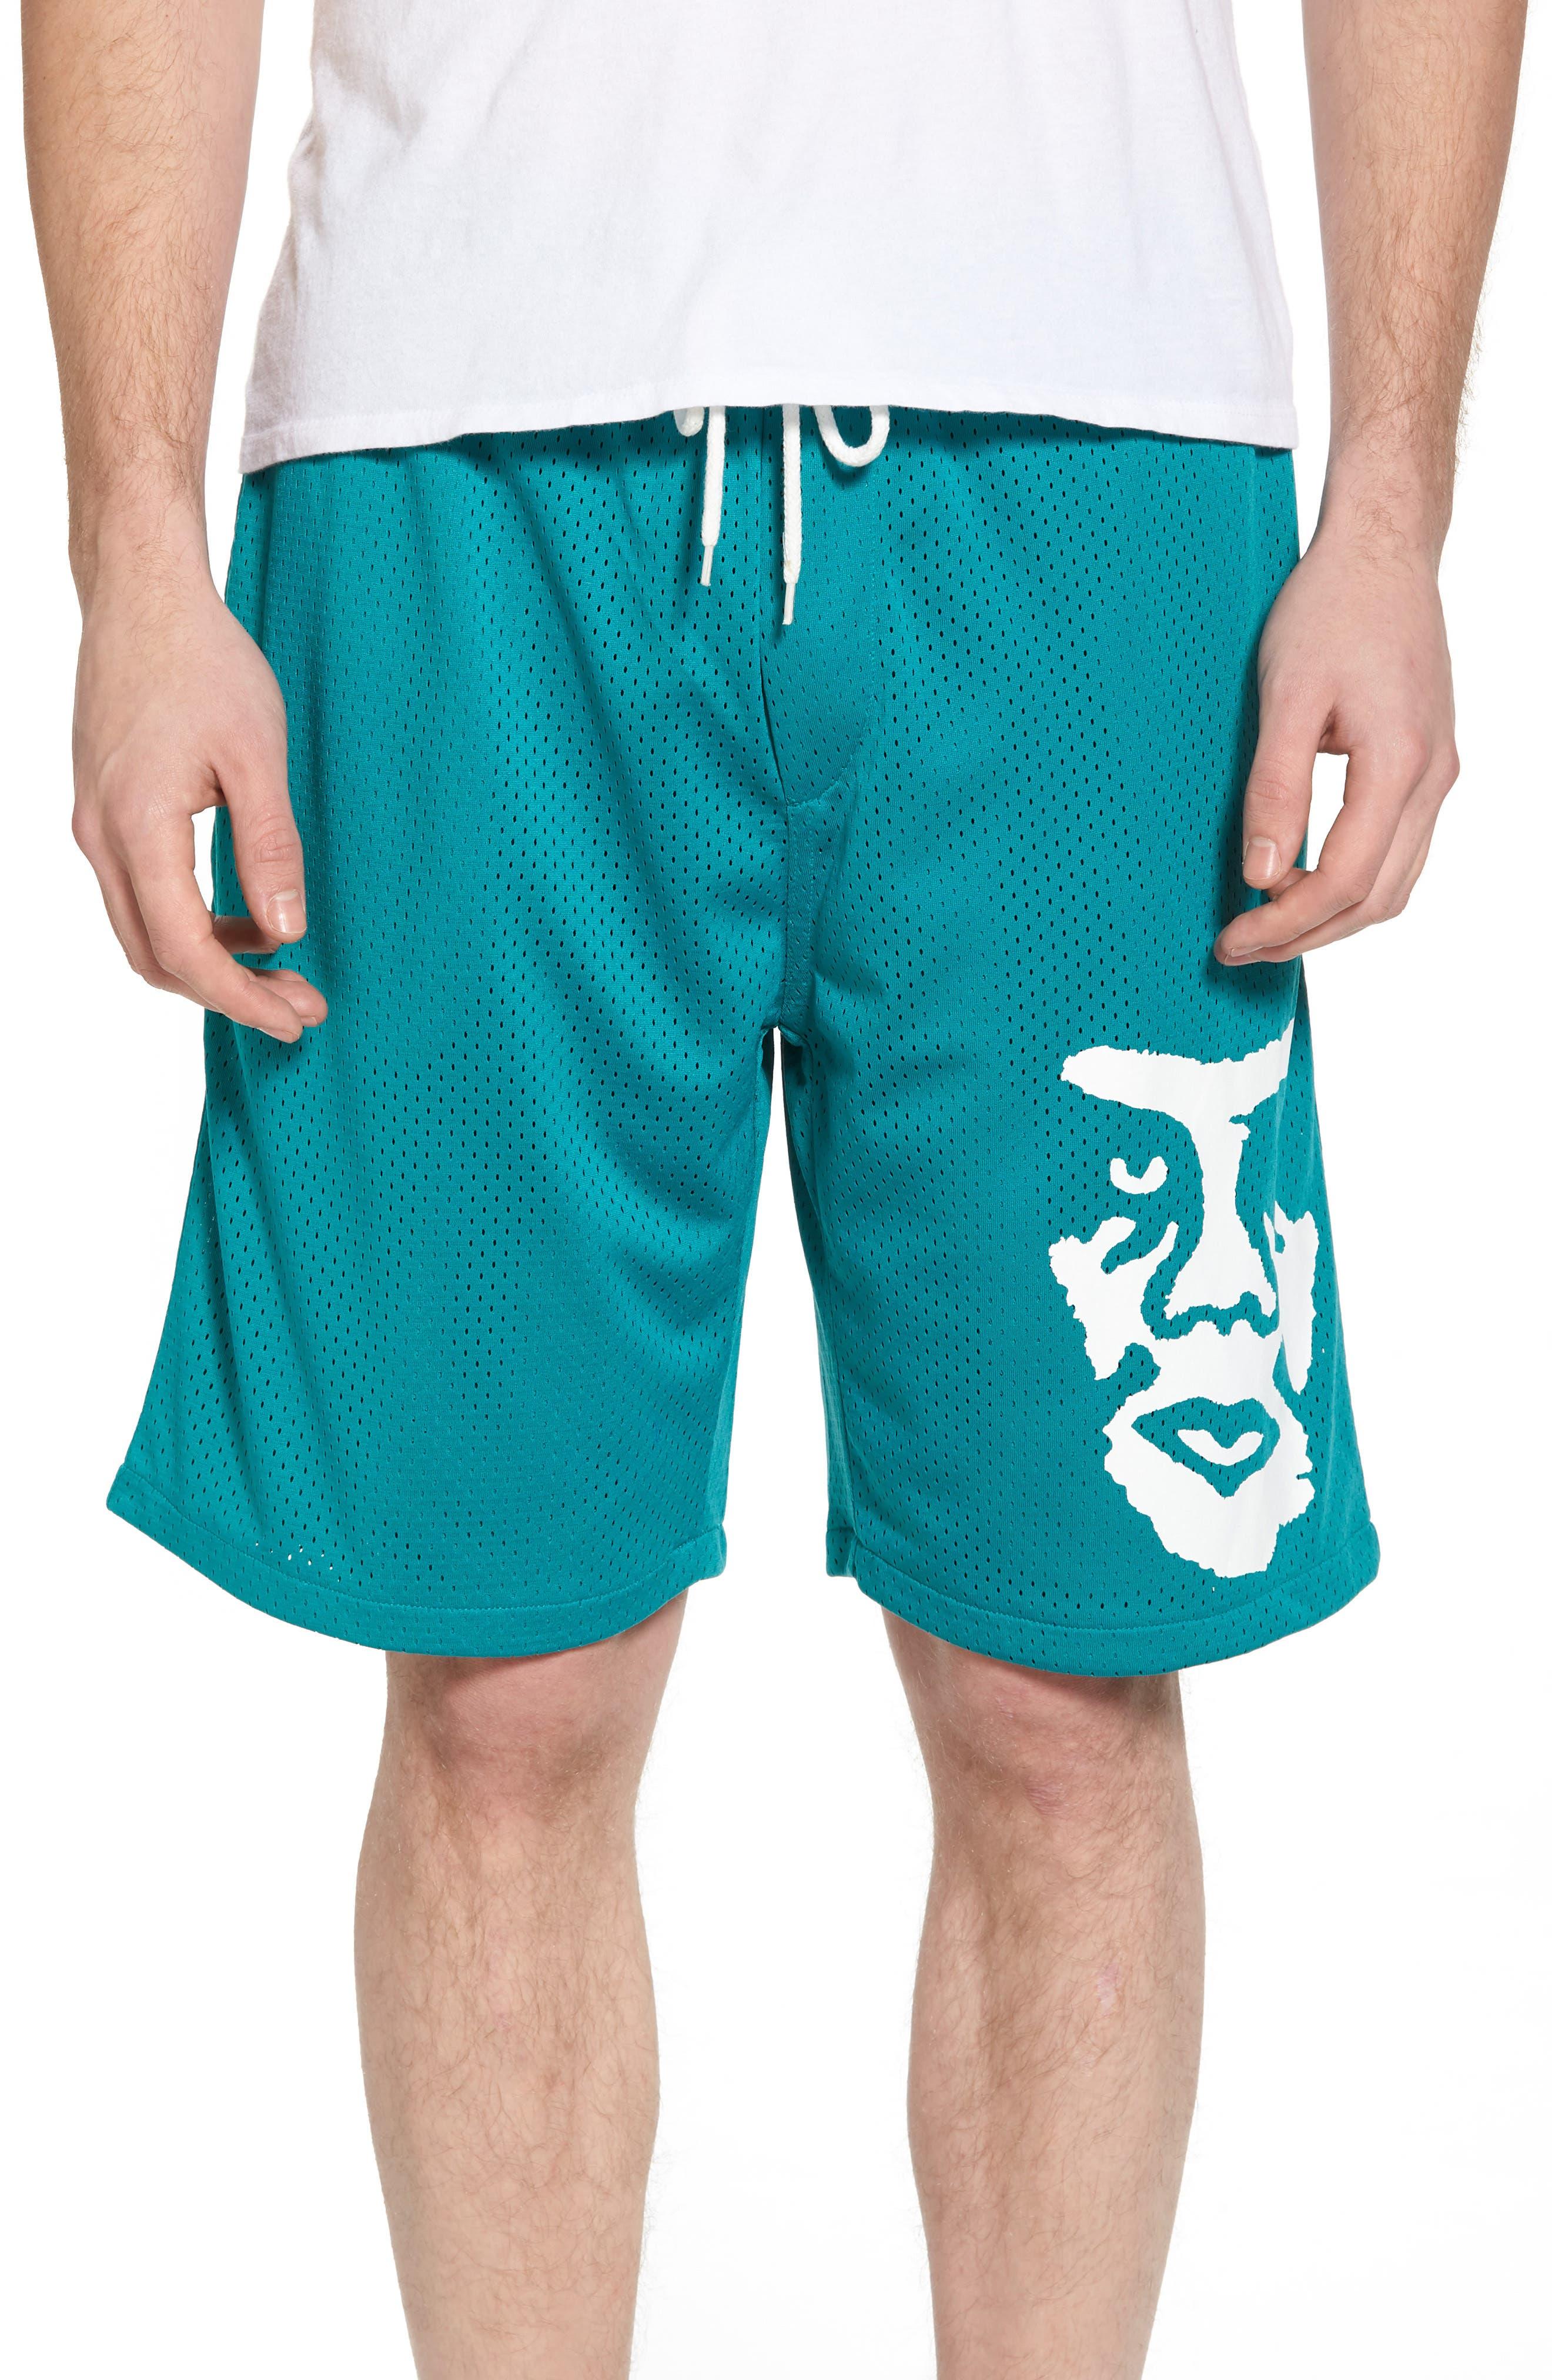 O.P.E. Athletic Shorts,                             Main thumbnail 1, color,                             445